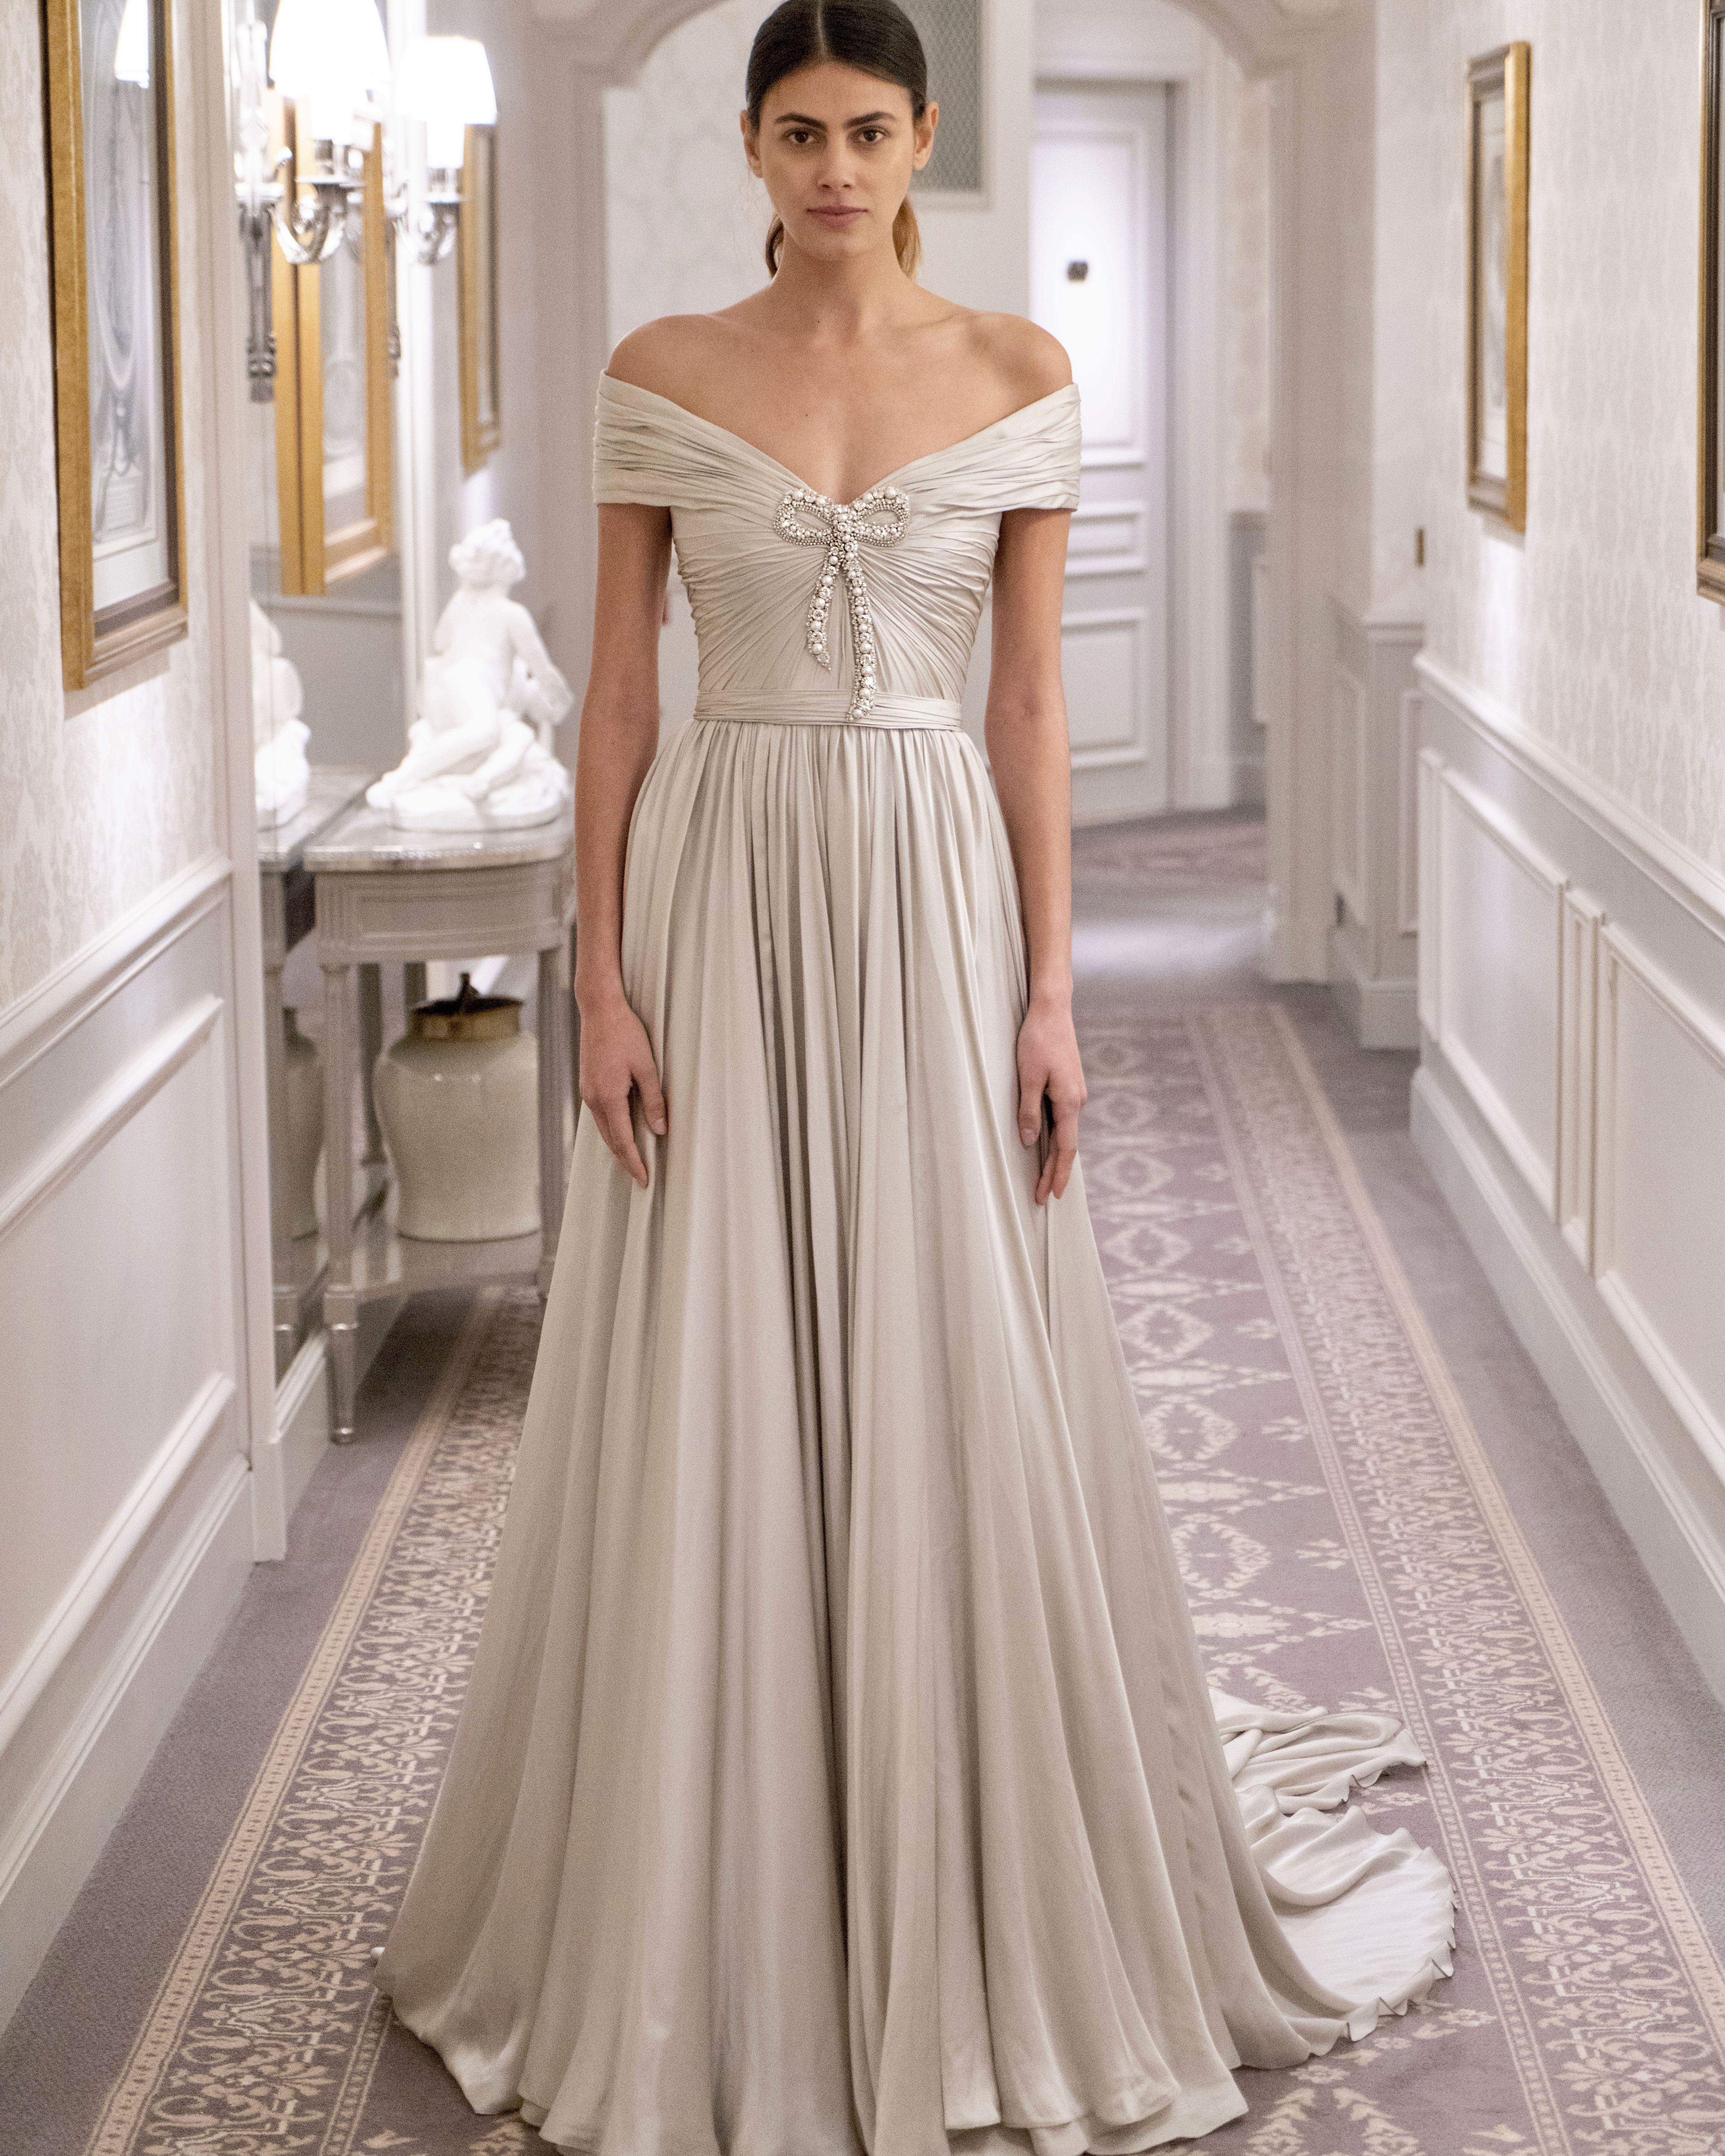 Divine elegance.  TheCelebrationCollection . . . Dress  Silver Lining   ReemAcra  ReemAcraWedding  fashion  bride  bridal  wedding  weddingdress 6df628fc4